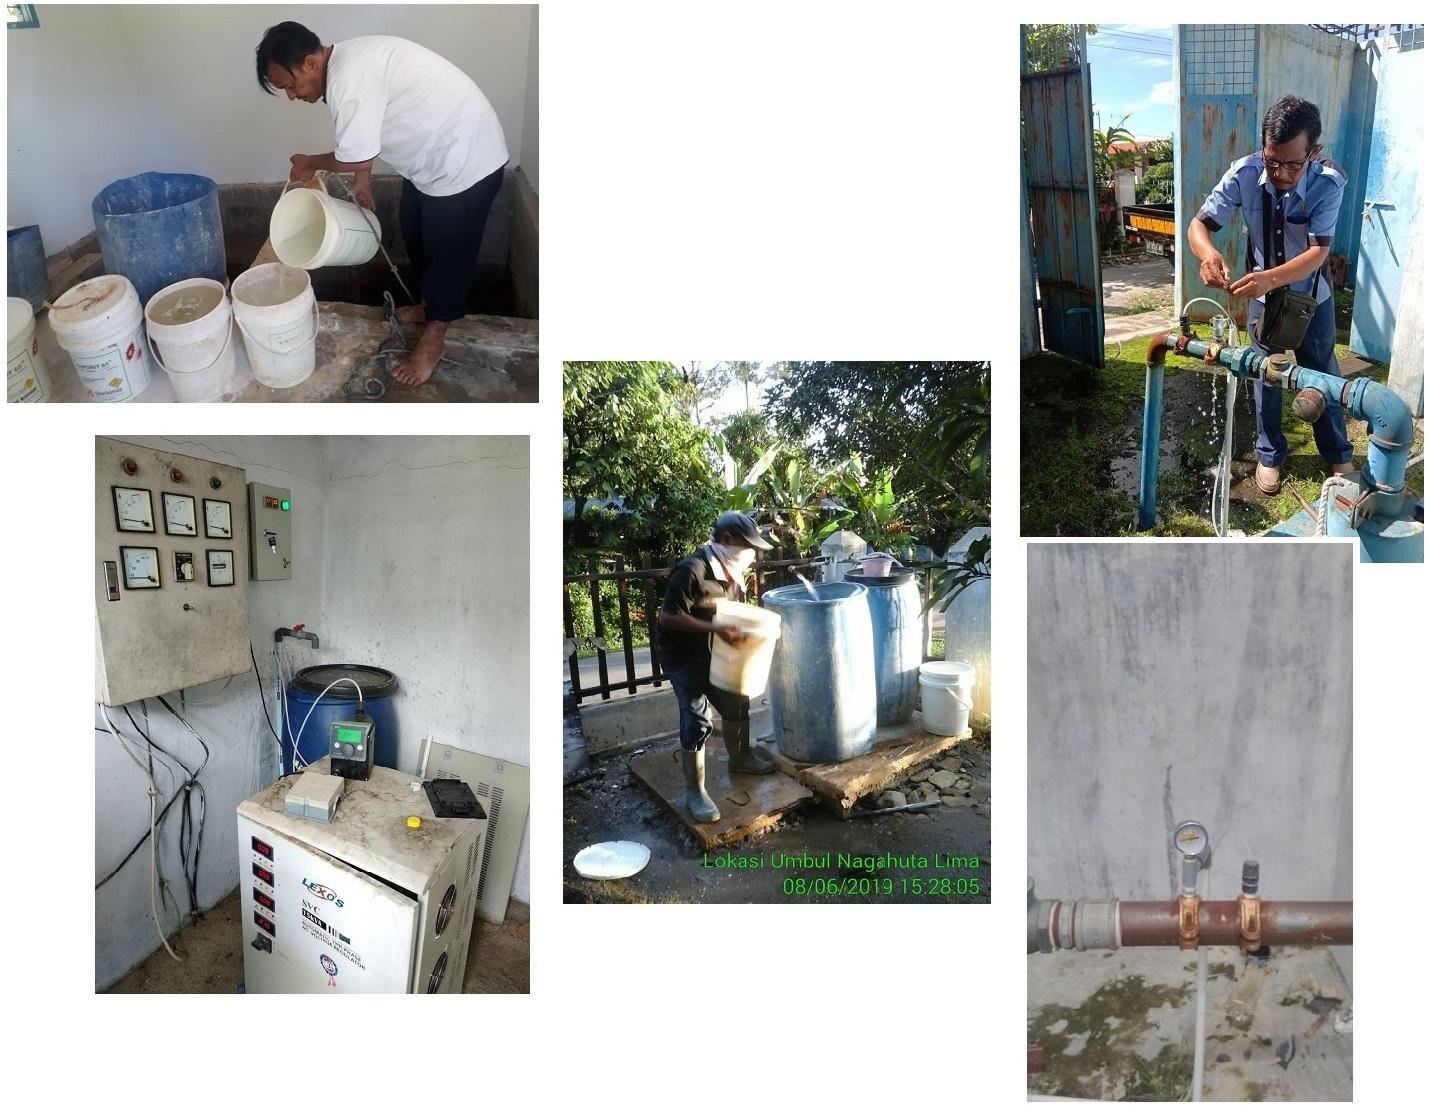 Kegiatan Pembubuhan Kaporit dan Pengecekan Pompa Dosing Kaporit Di Sumber Air PDAM Tirtauli Kota Pematangsiantar